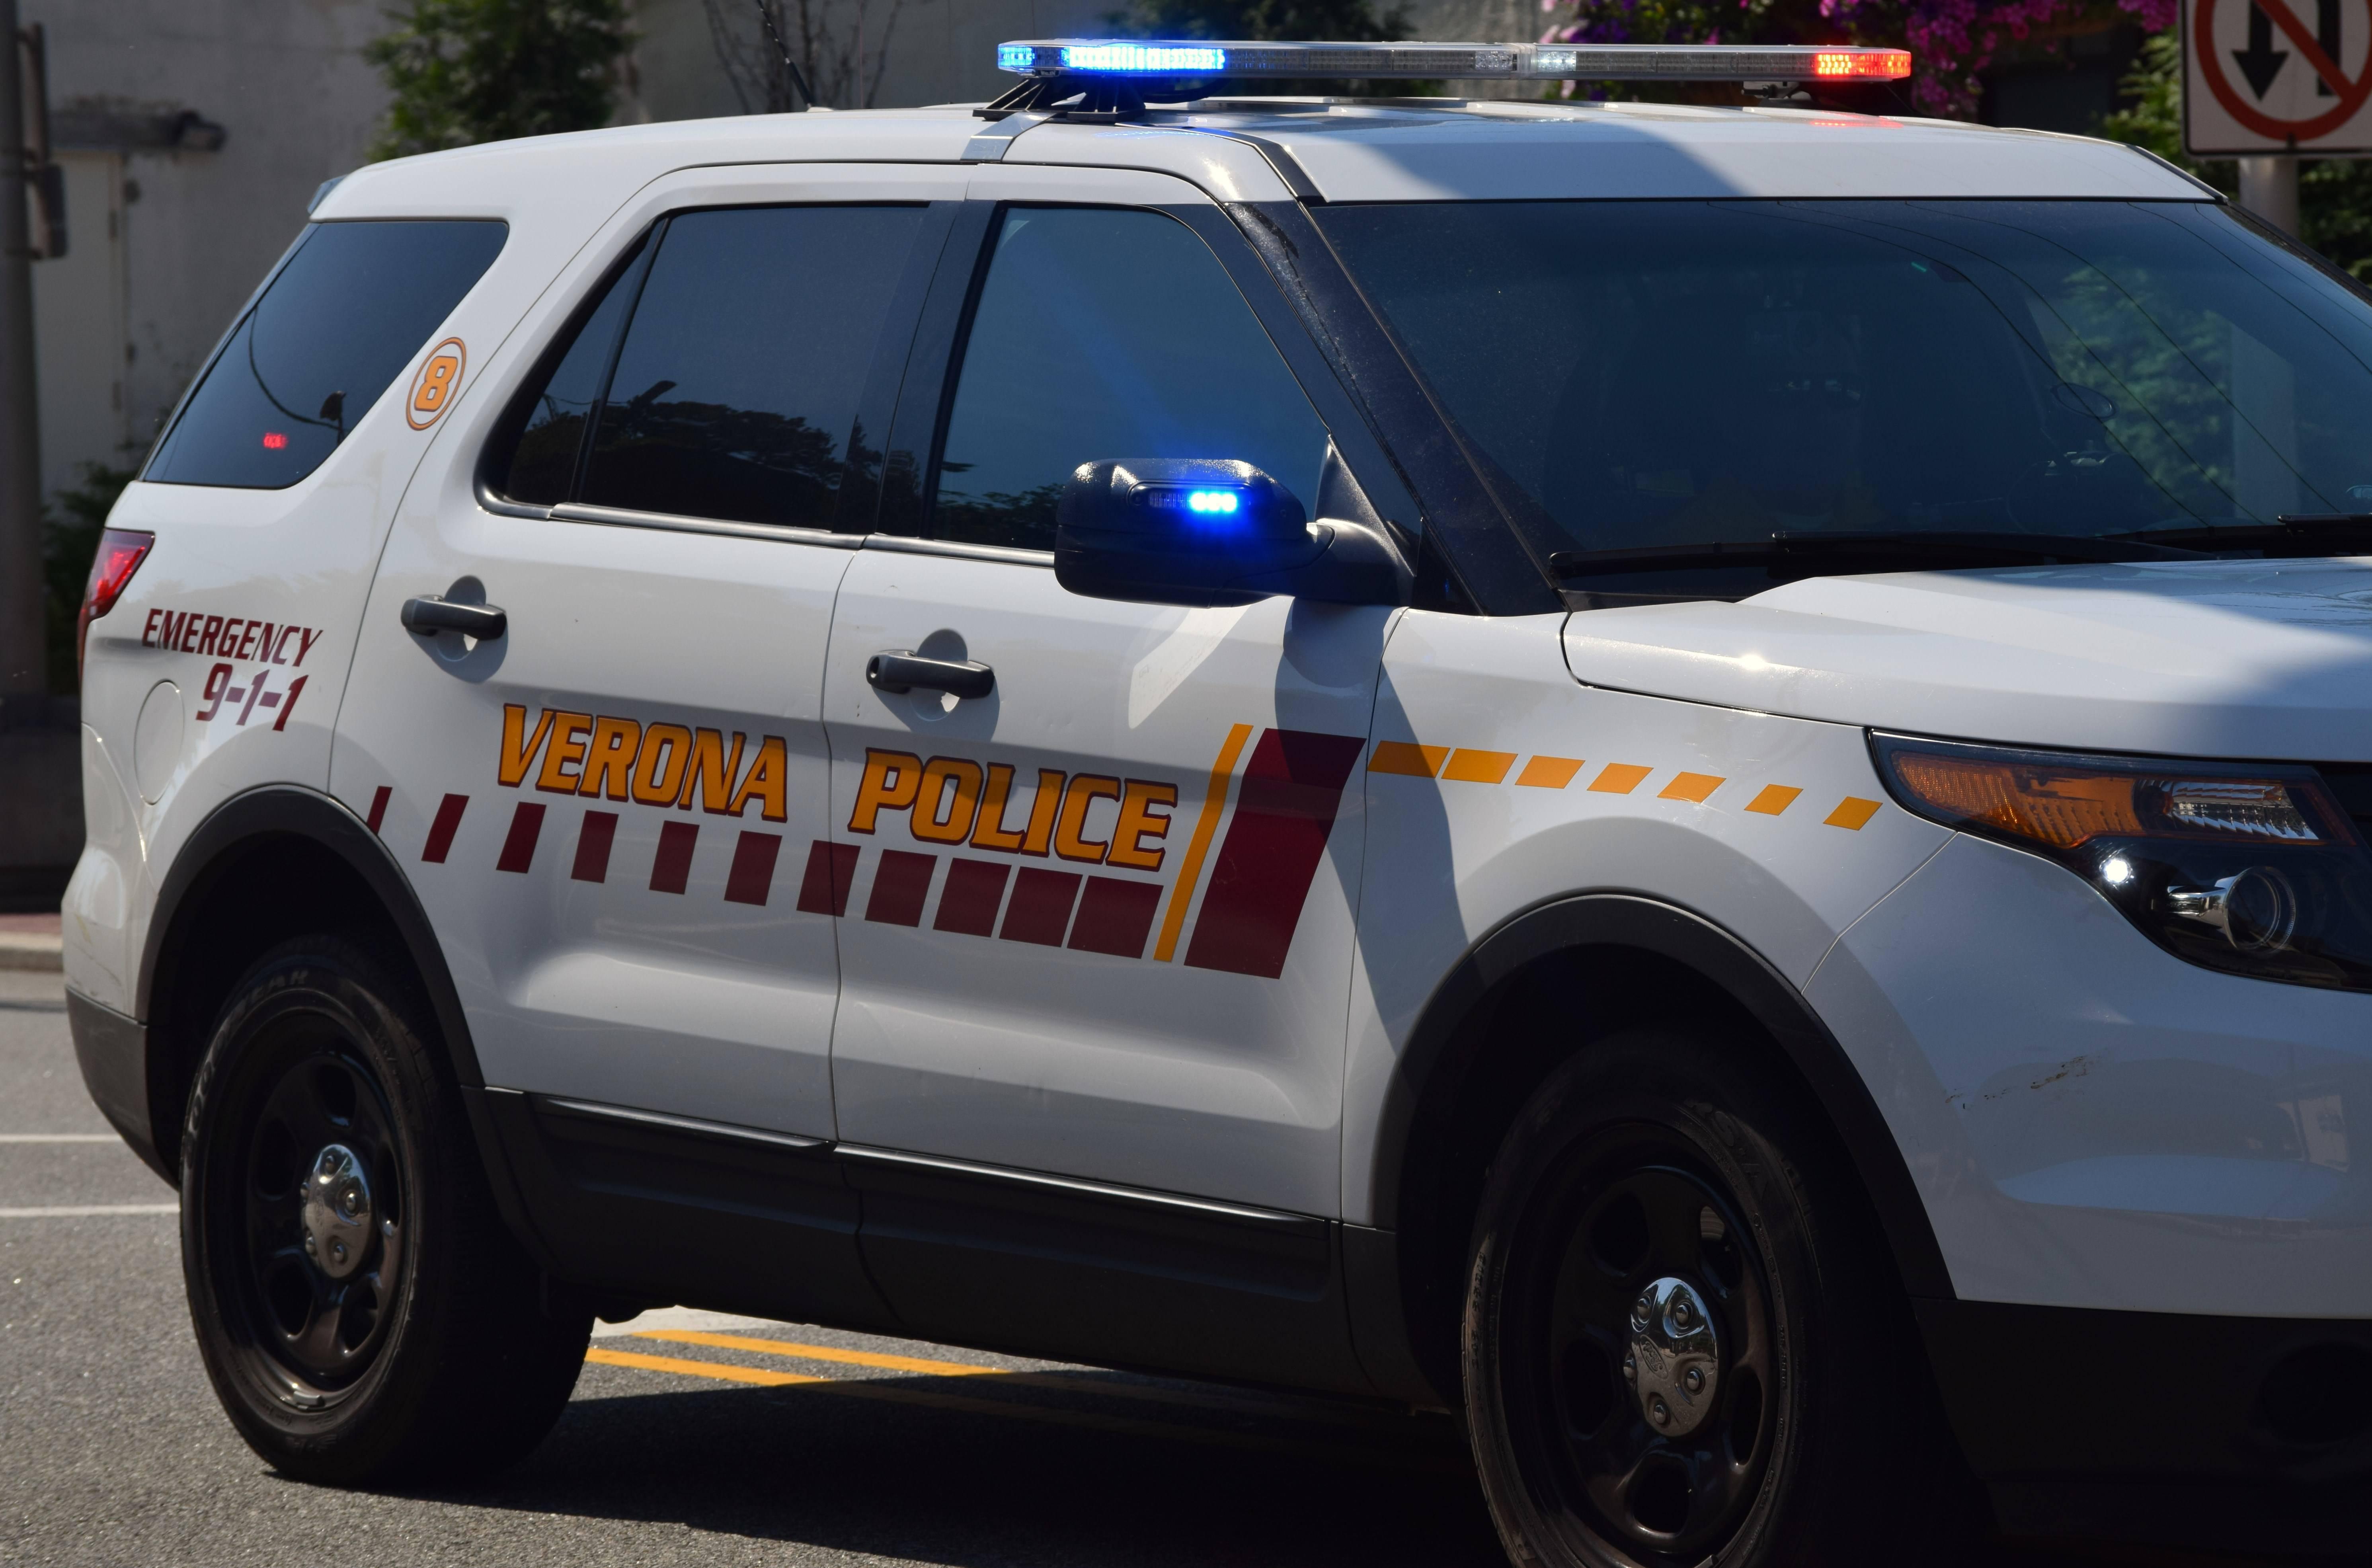 b8f524b87869f7cb2e7c_Verona_Police_car.JPG